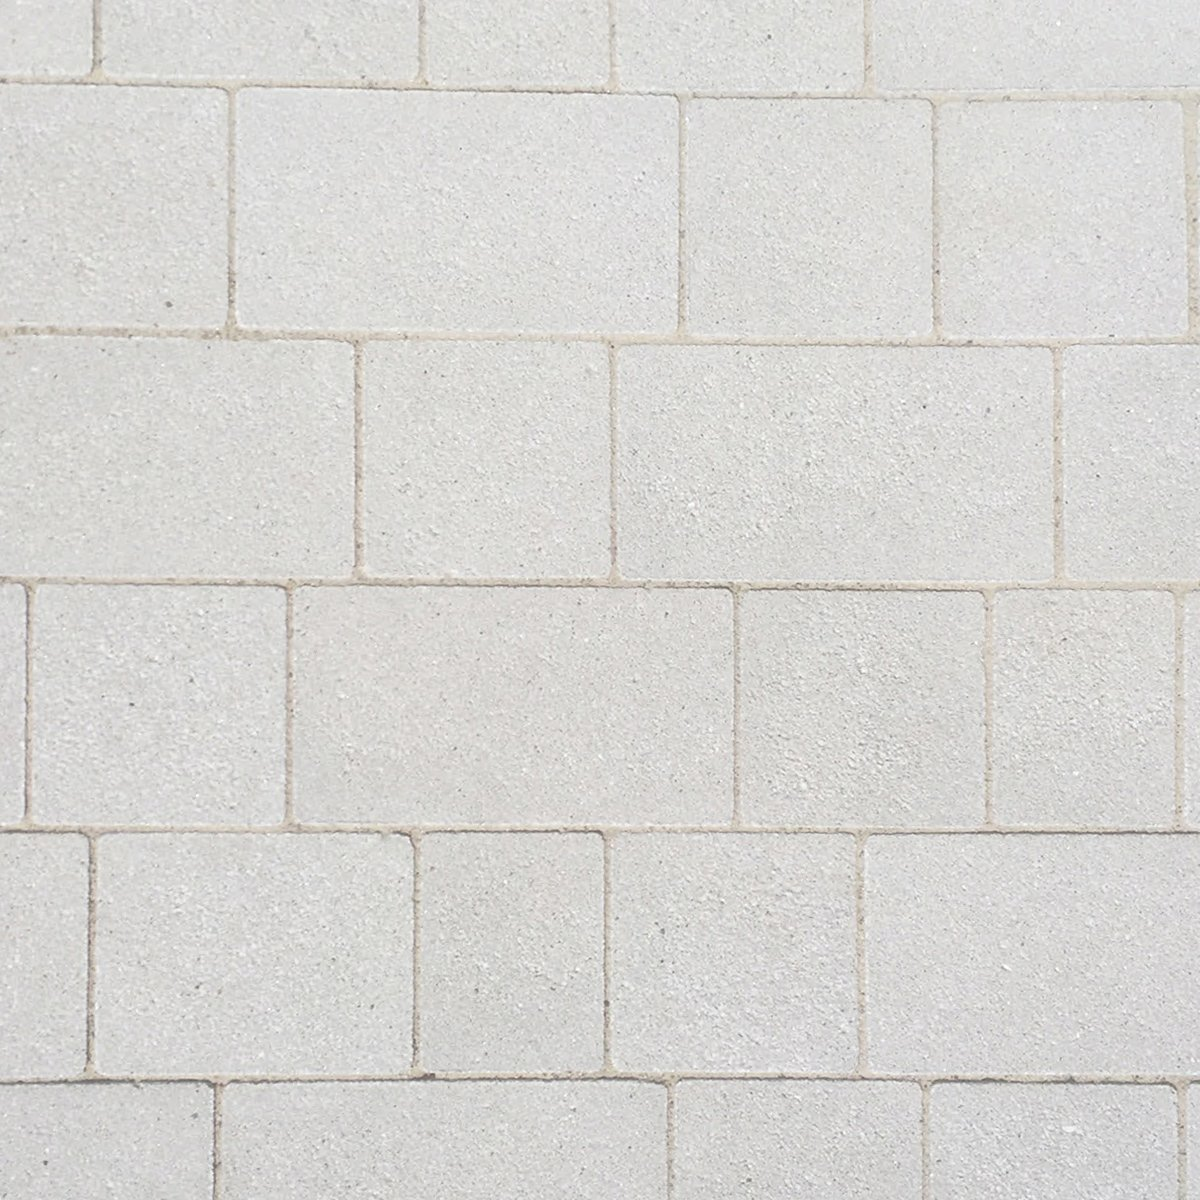 Klostersten Tek maskinsten kuglehærdet hvid marmor